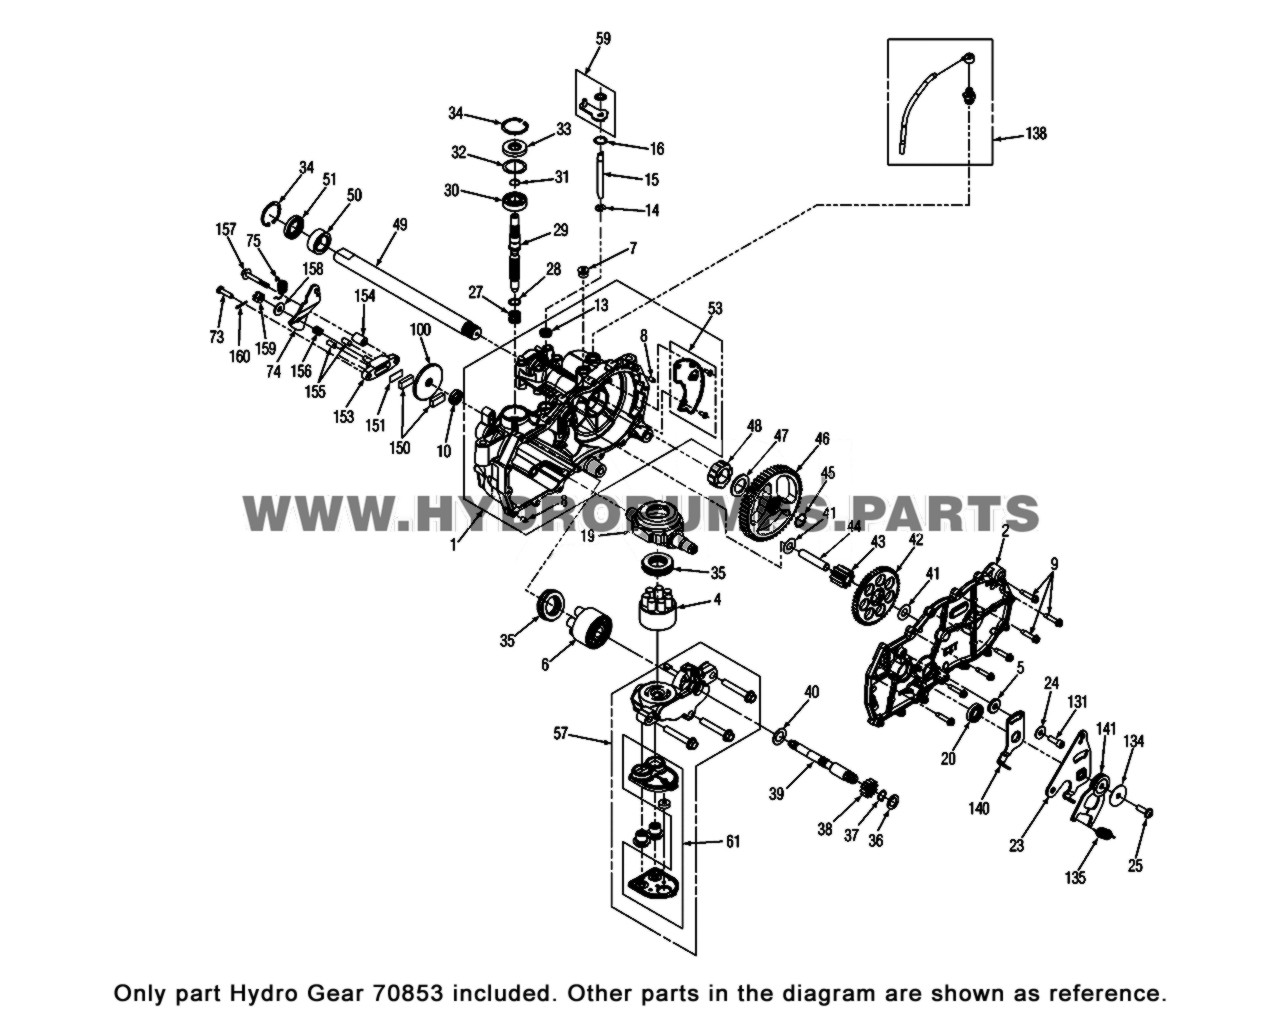 Parts lookup Hydro Gear 70853 Seal Kit OEM diagra,